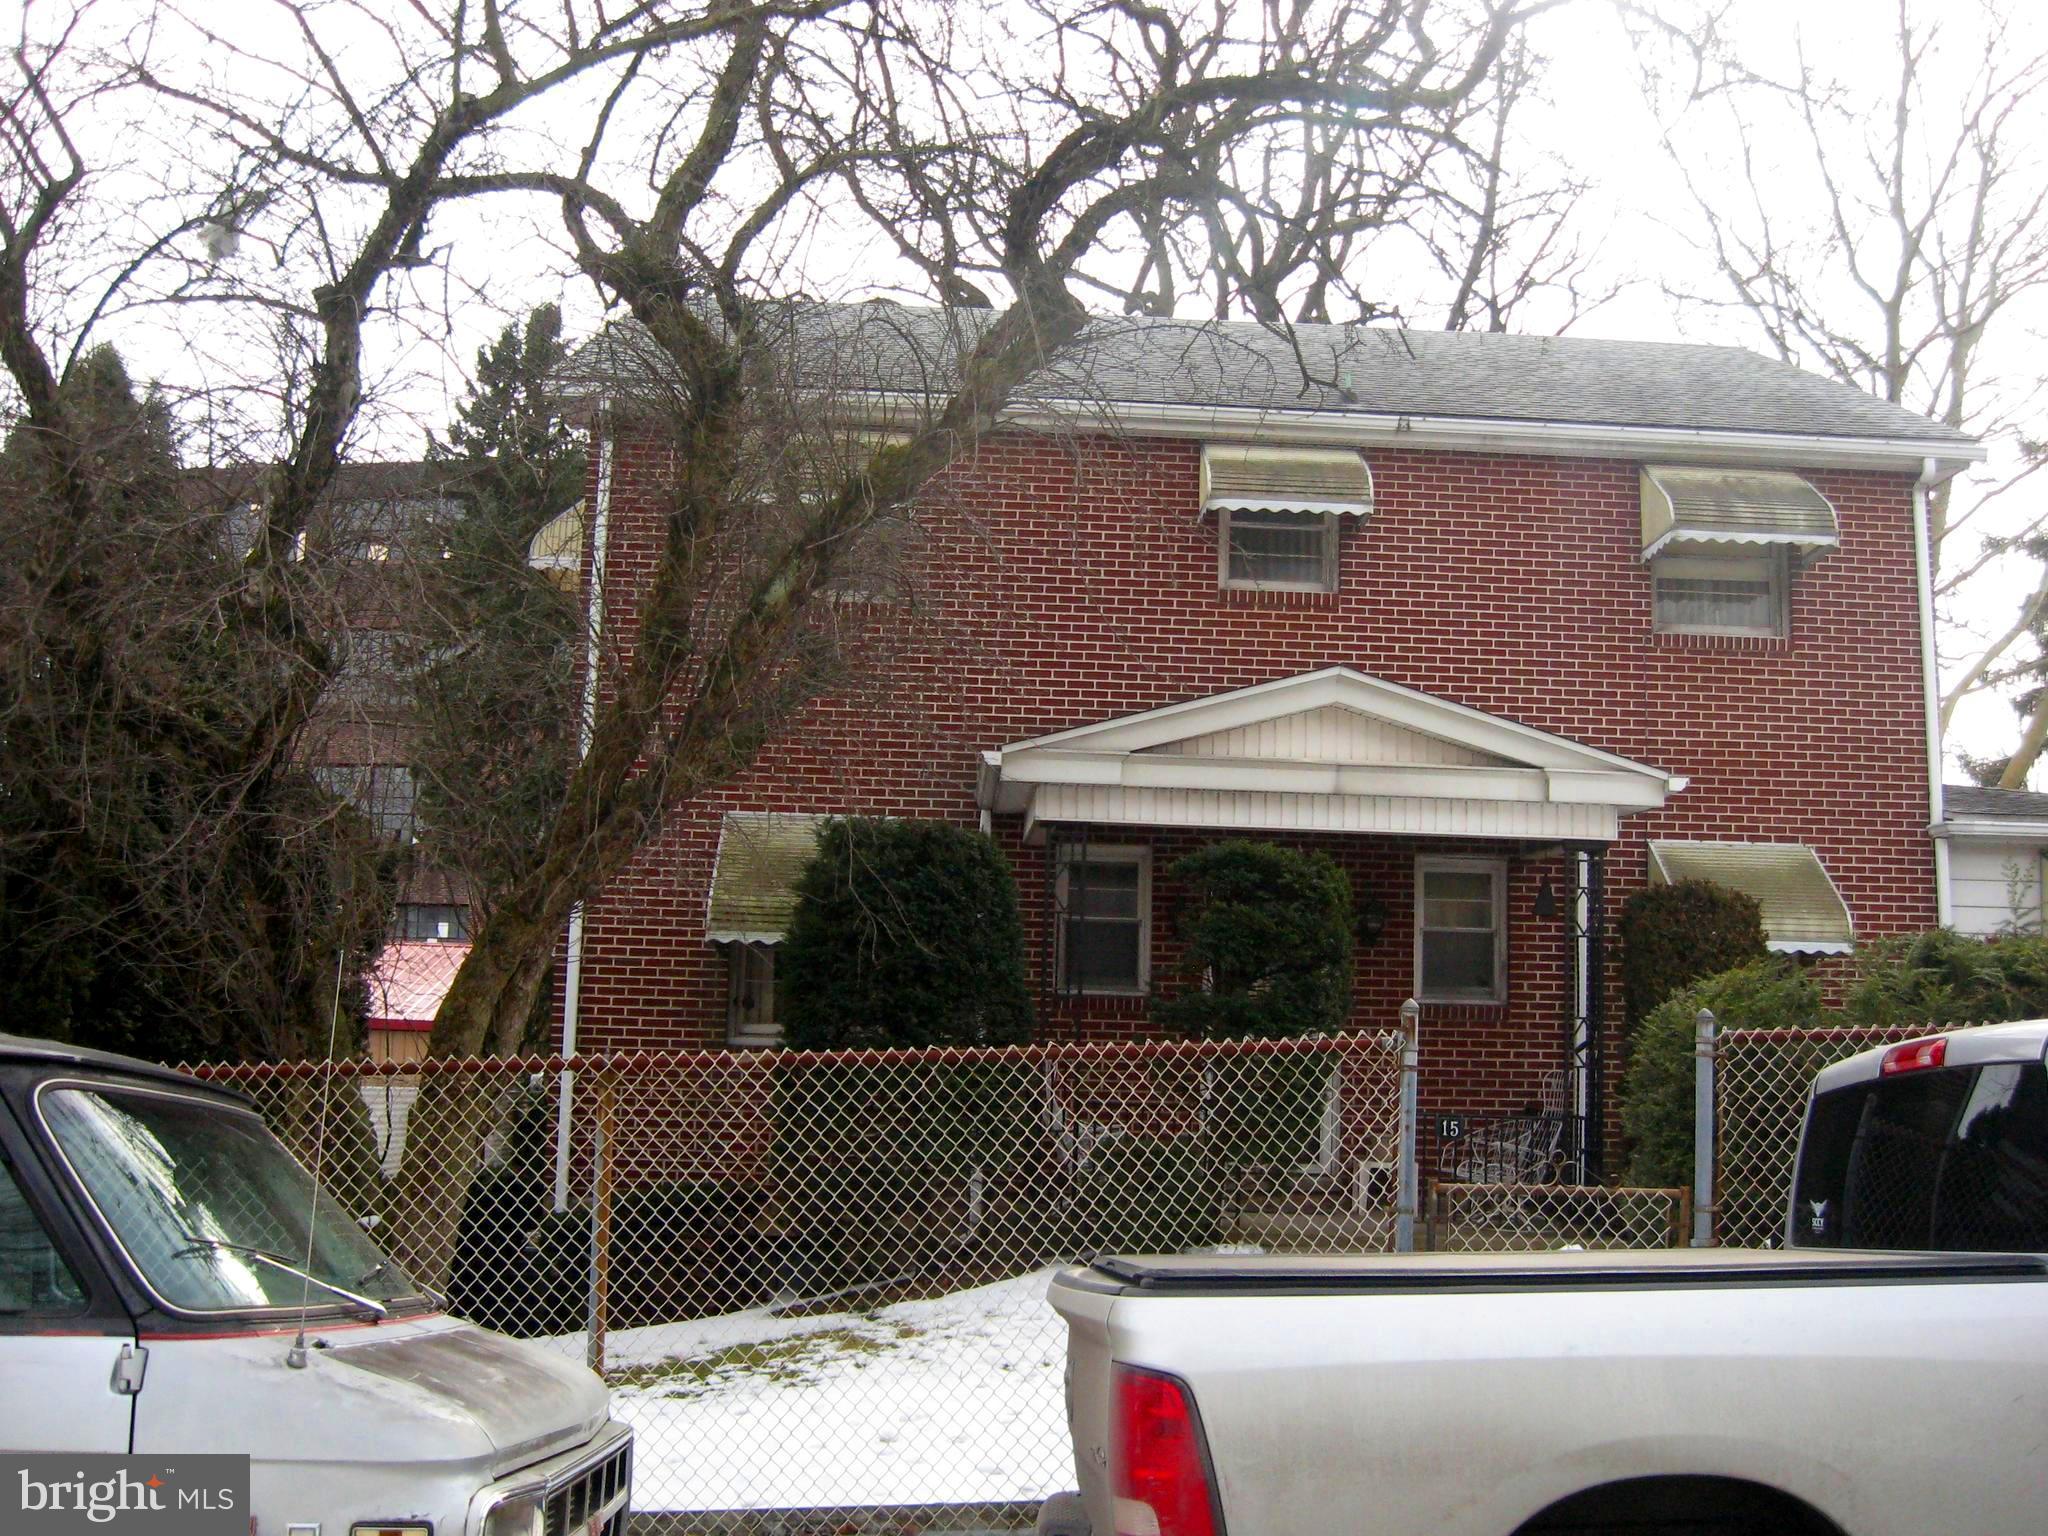 15 W CARBON STREET, MINERSVILLE, PA 17954